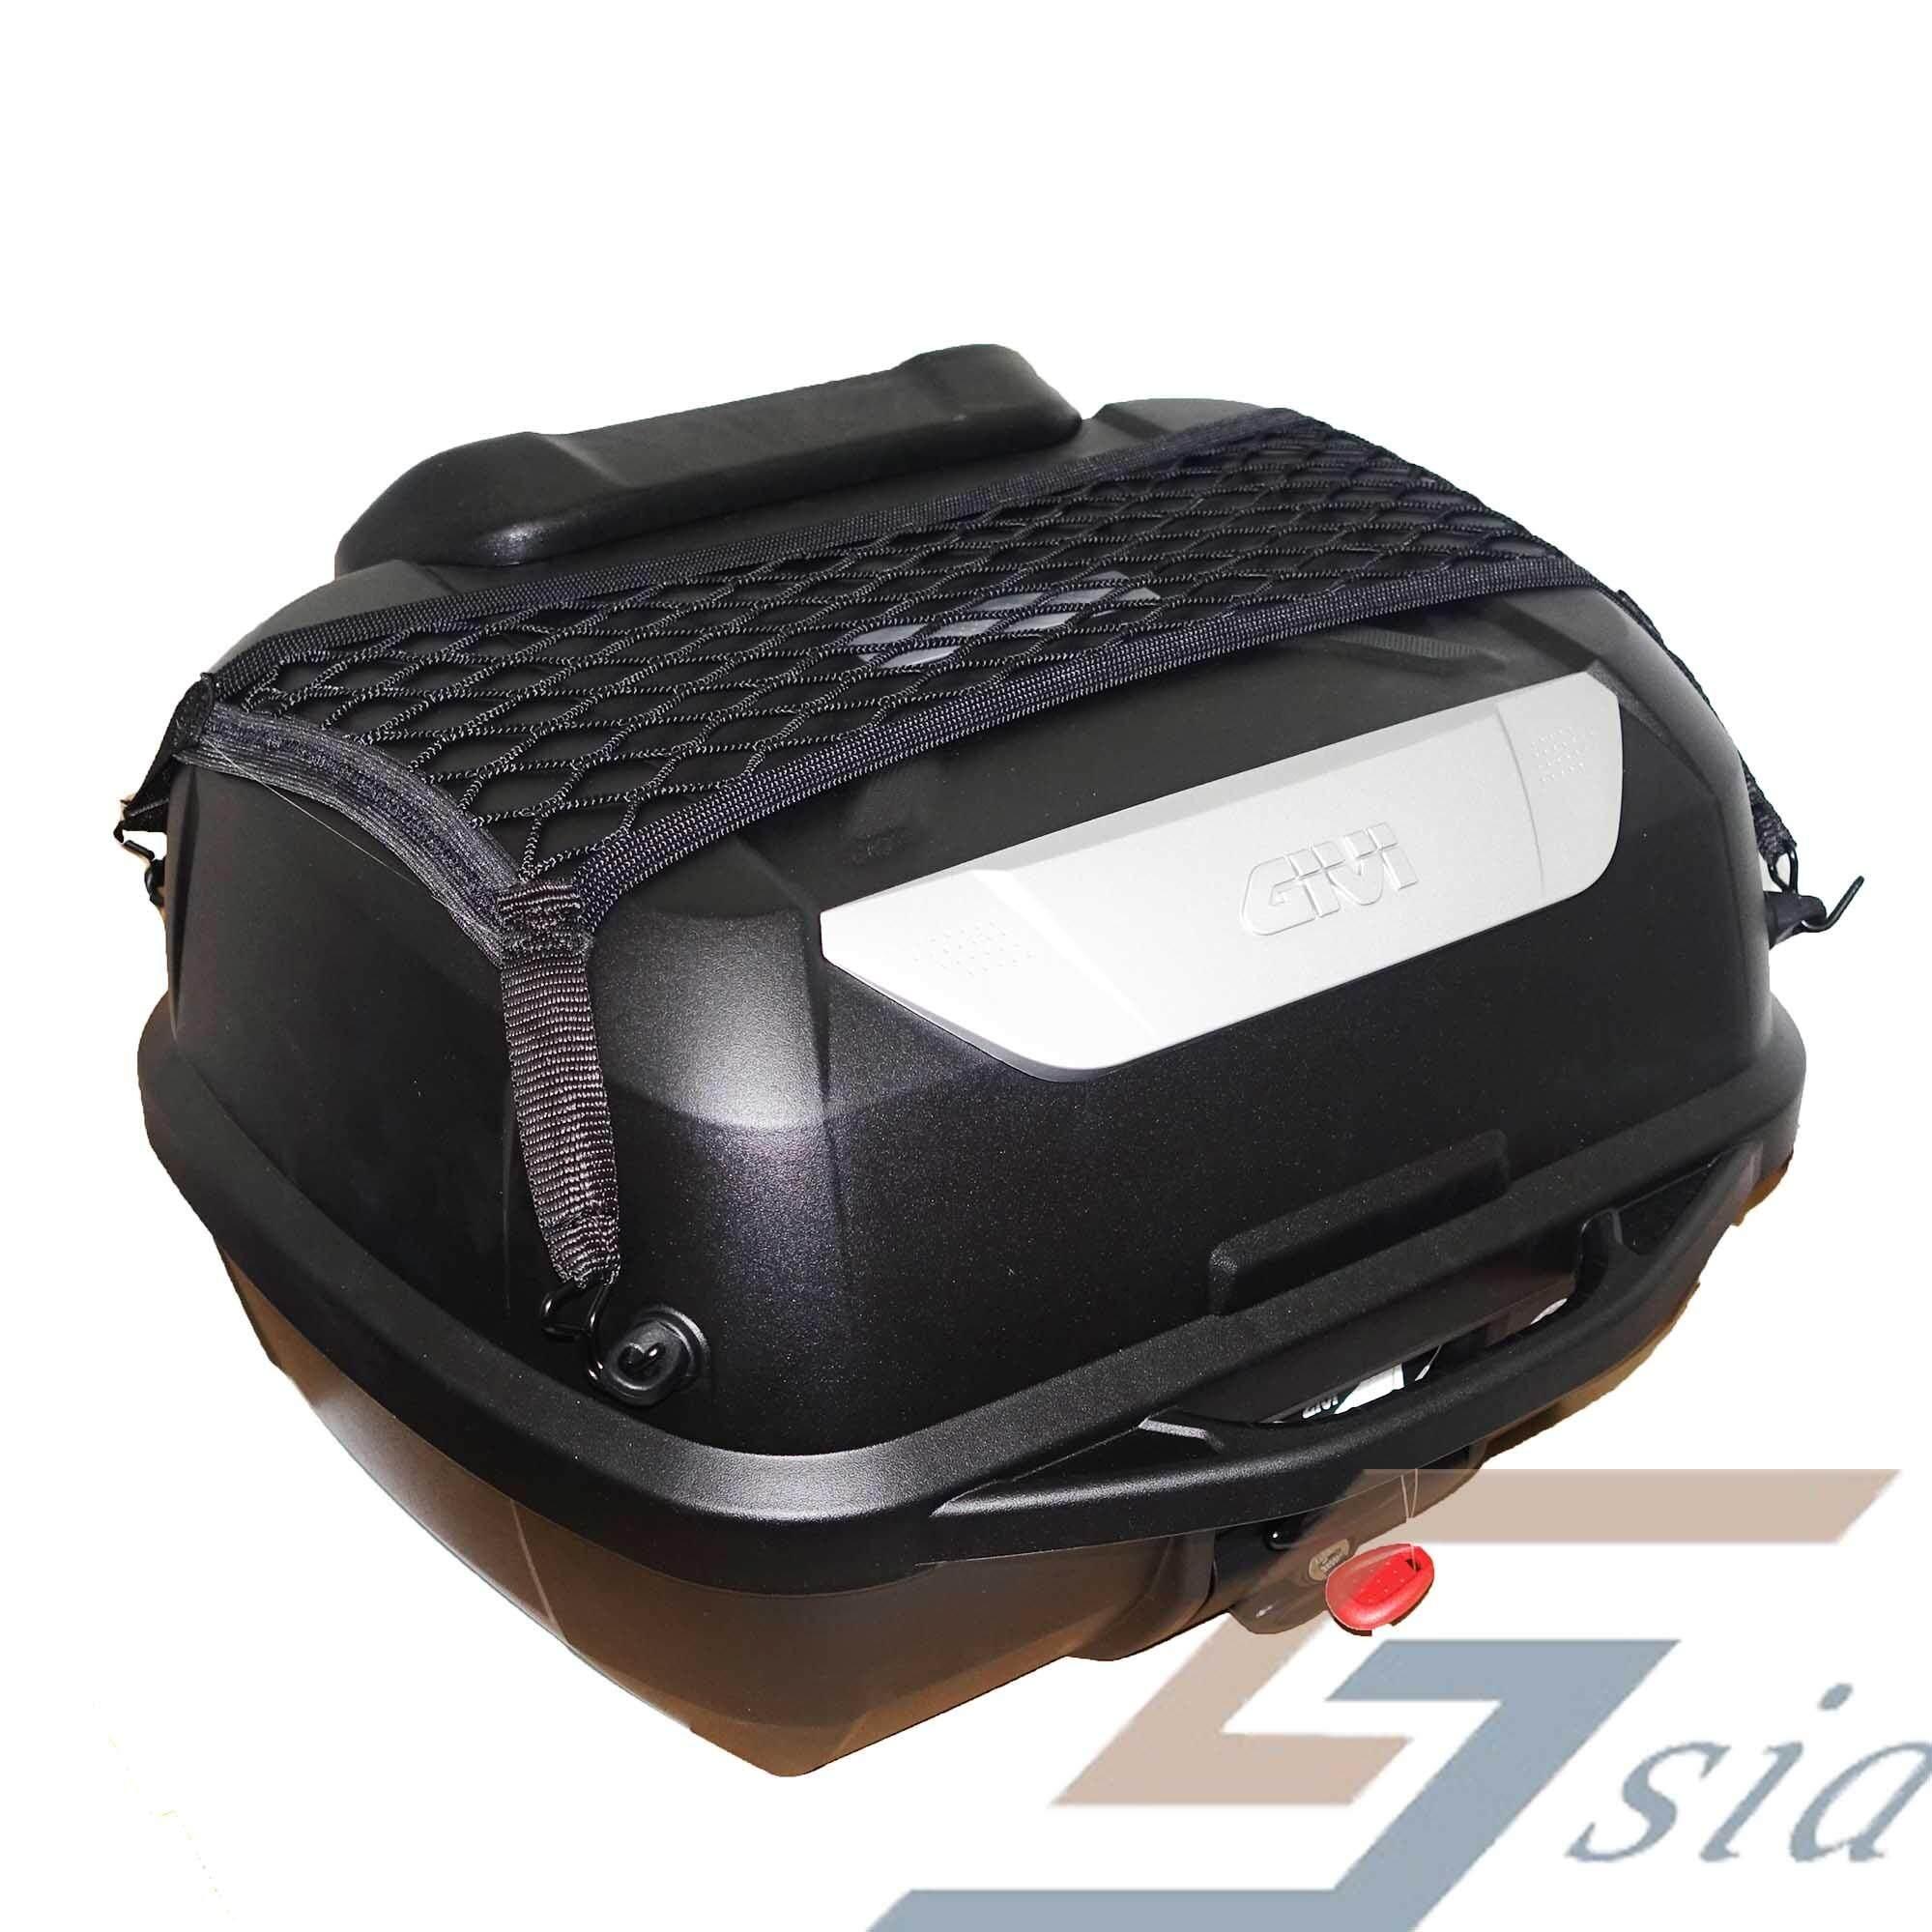 GIVI Mulebox Monolock Topcase 43 Black Advance Tech (43LT)